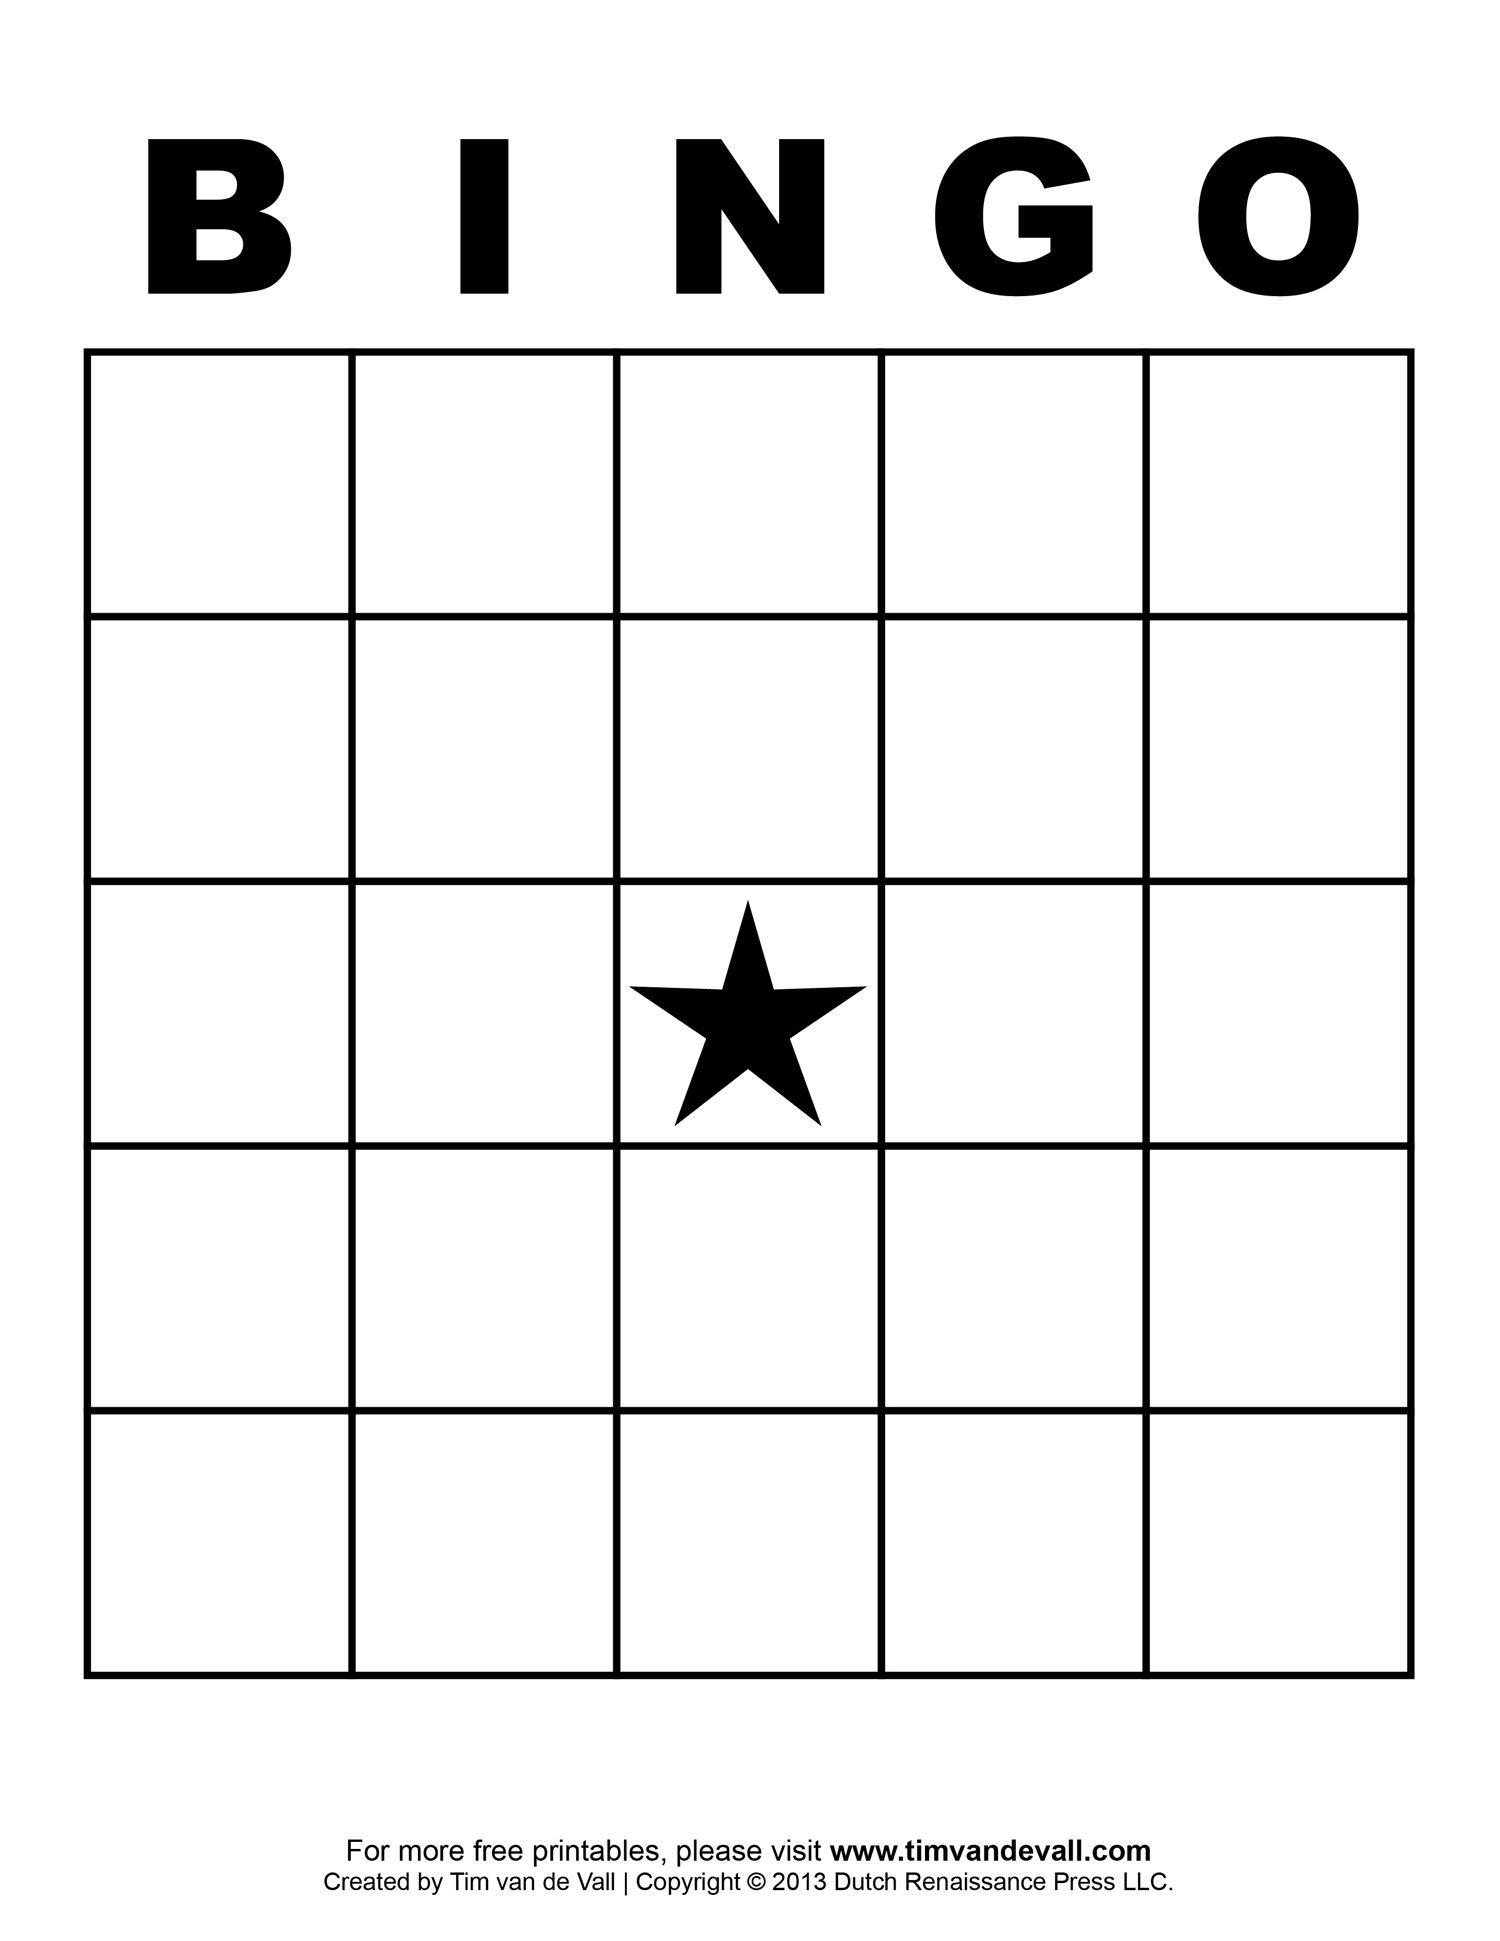 Free Printable Blank Bingo Cards Template 4 X 4 | Classroom | Sight - Free Printable Bingo Cards 1 100